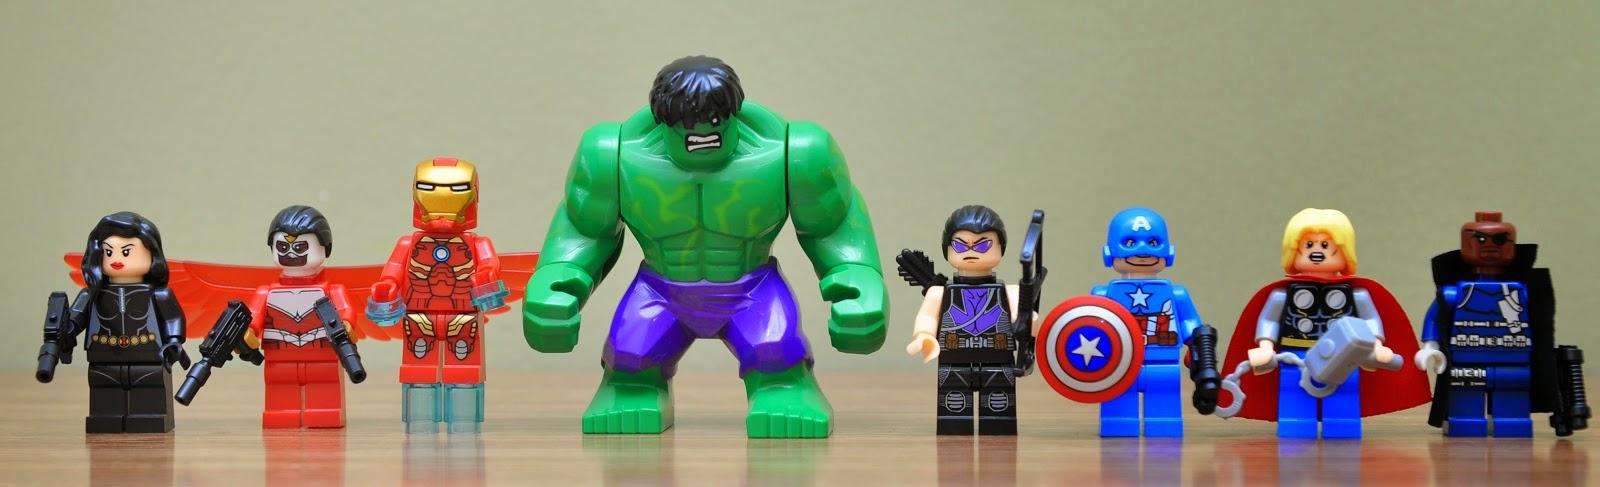 lego ironman mark 3 cartoon vs movie version bootleg iron man 2 starring